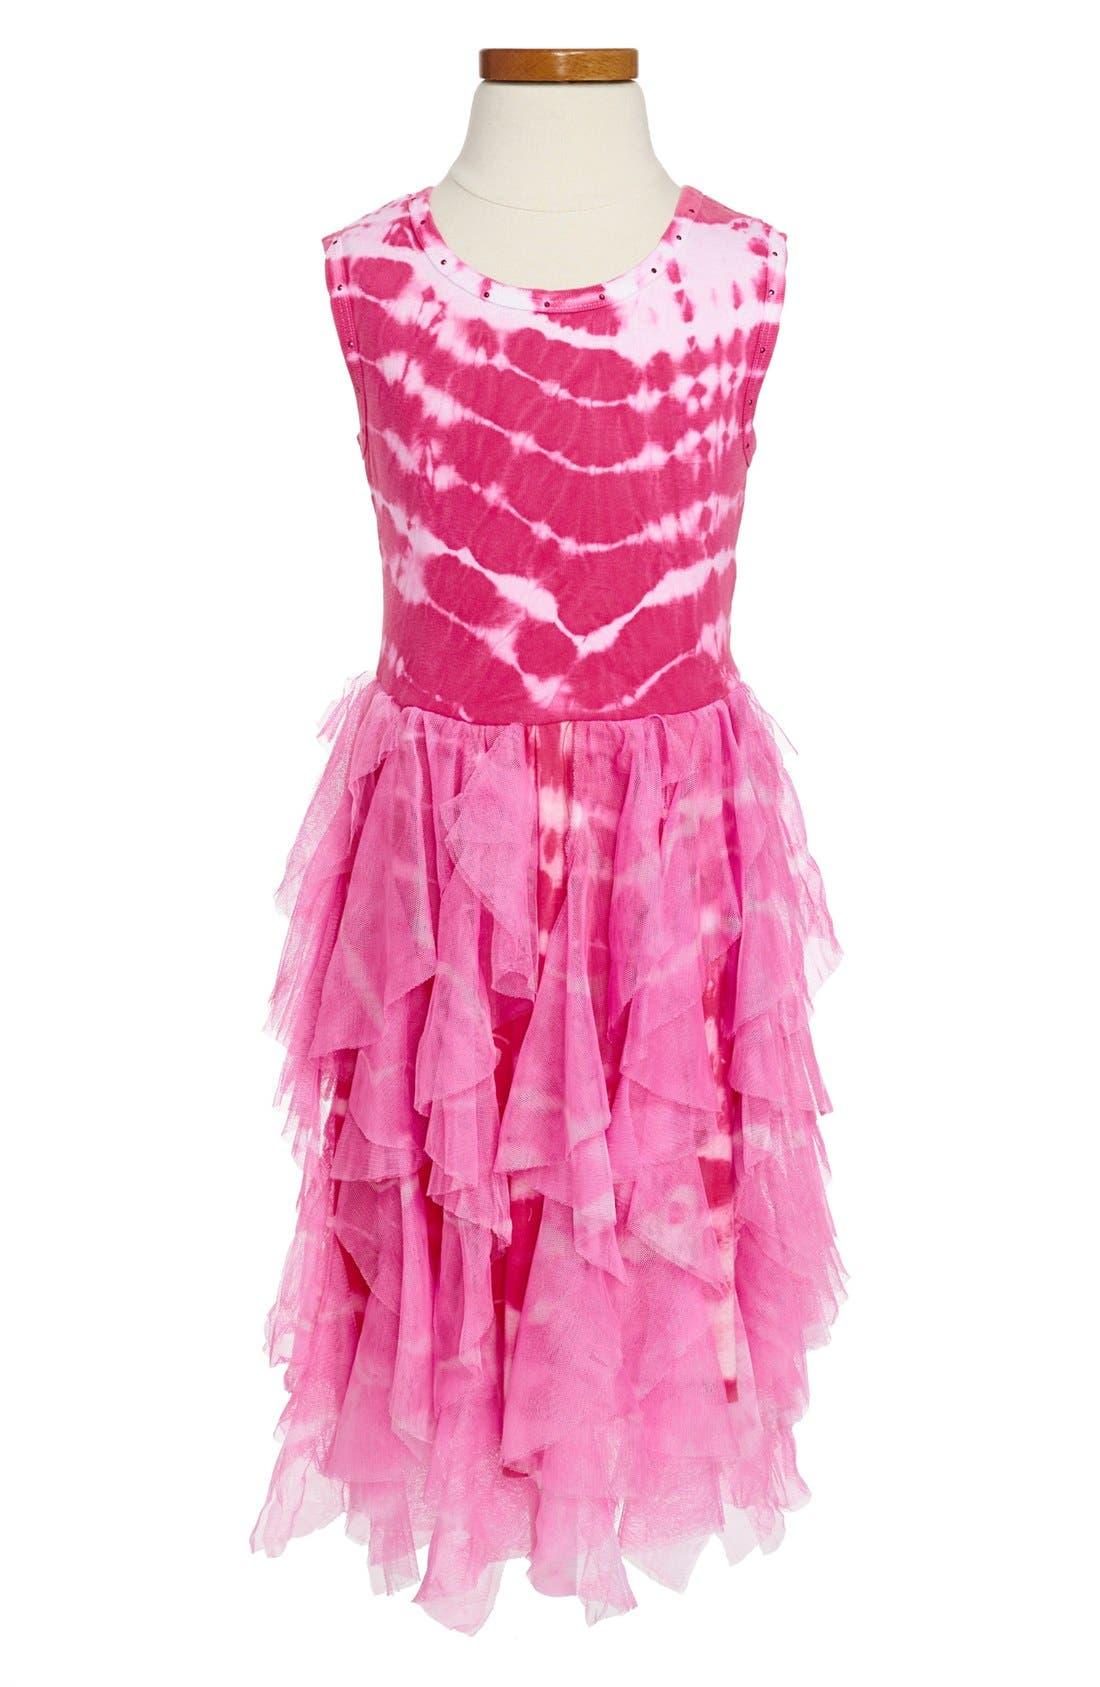 Alternate Image 1 Selected - Mignone Tie Dye Dress (Little Girls & Big Girls)